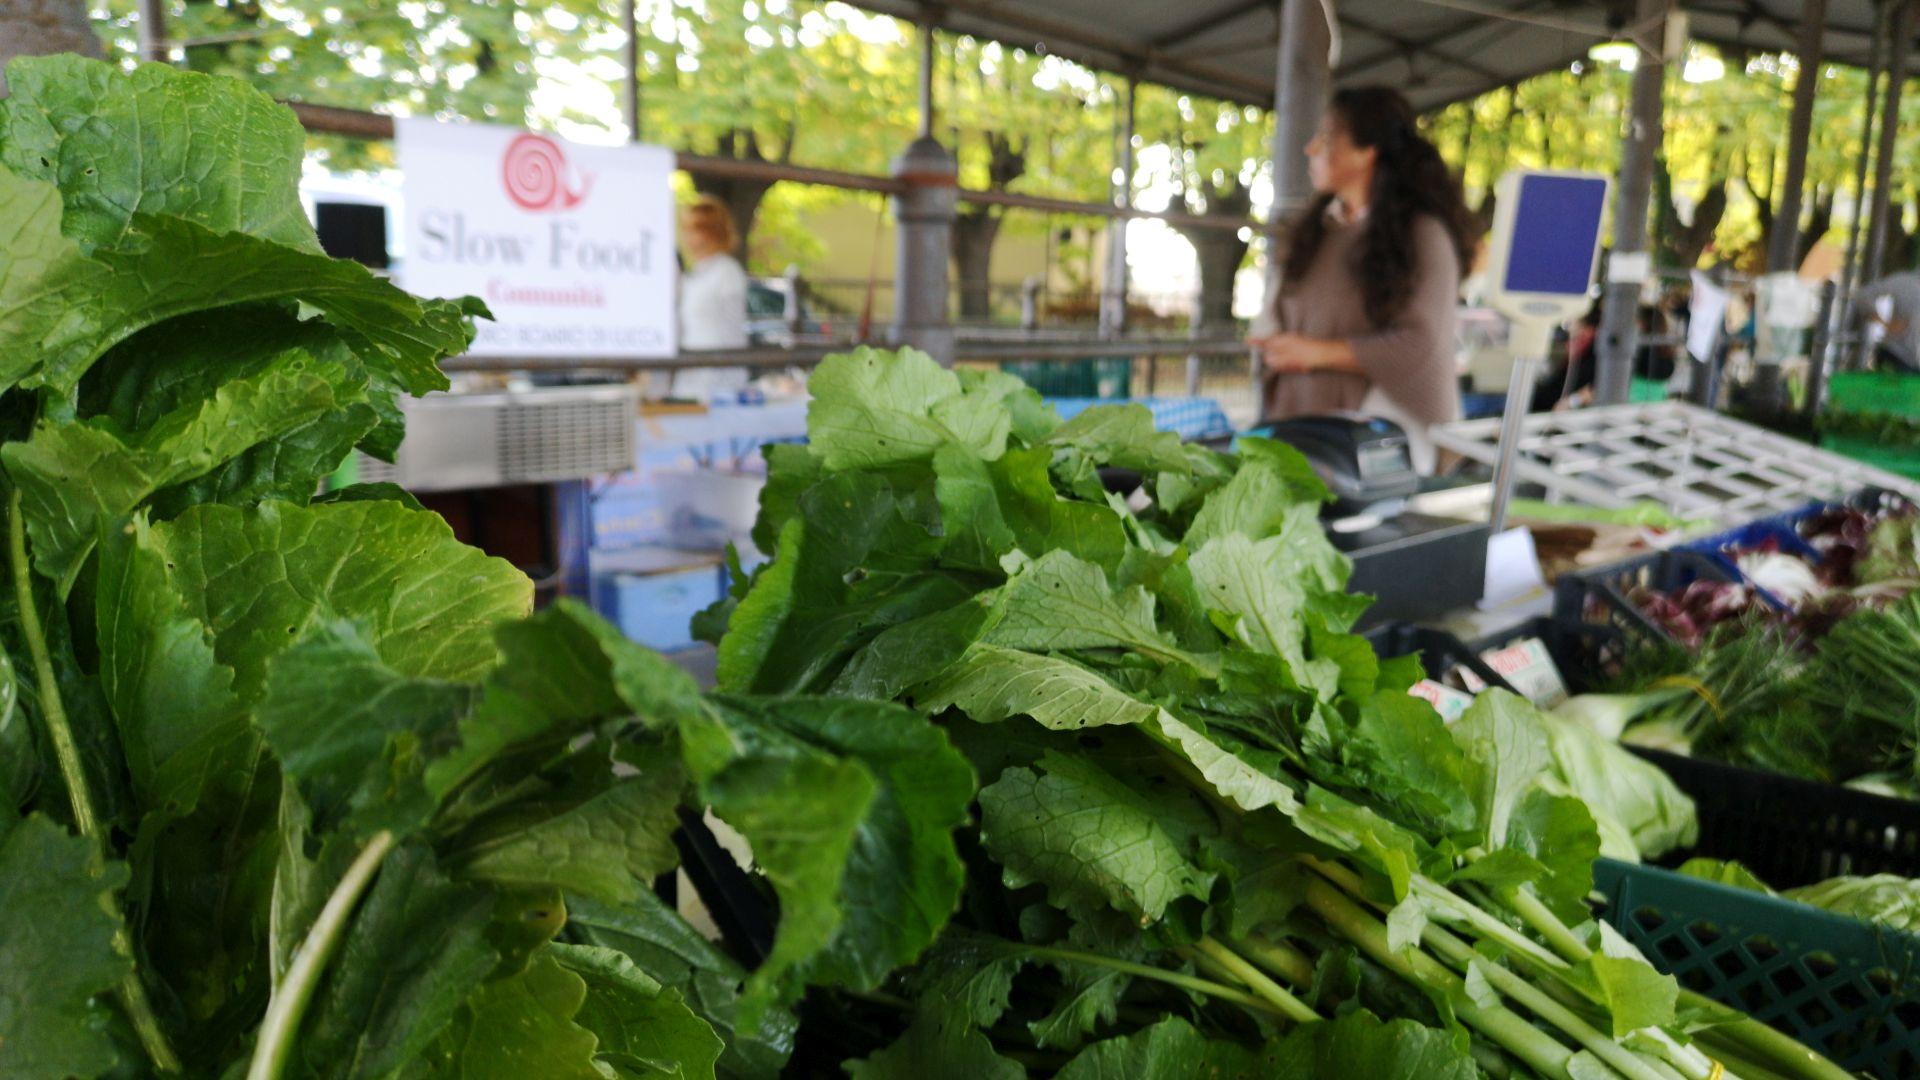 market day at Foro Boario in Lucca